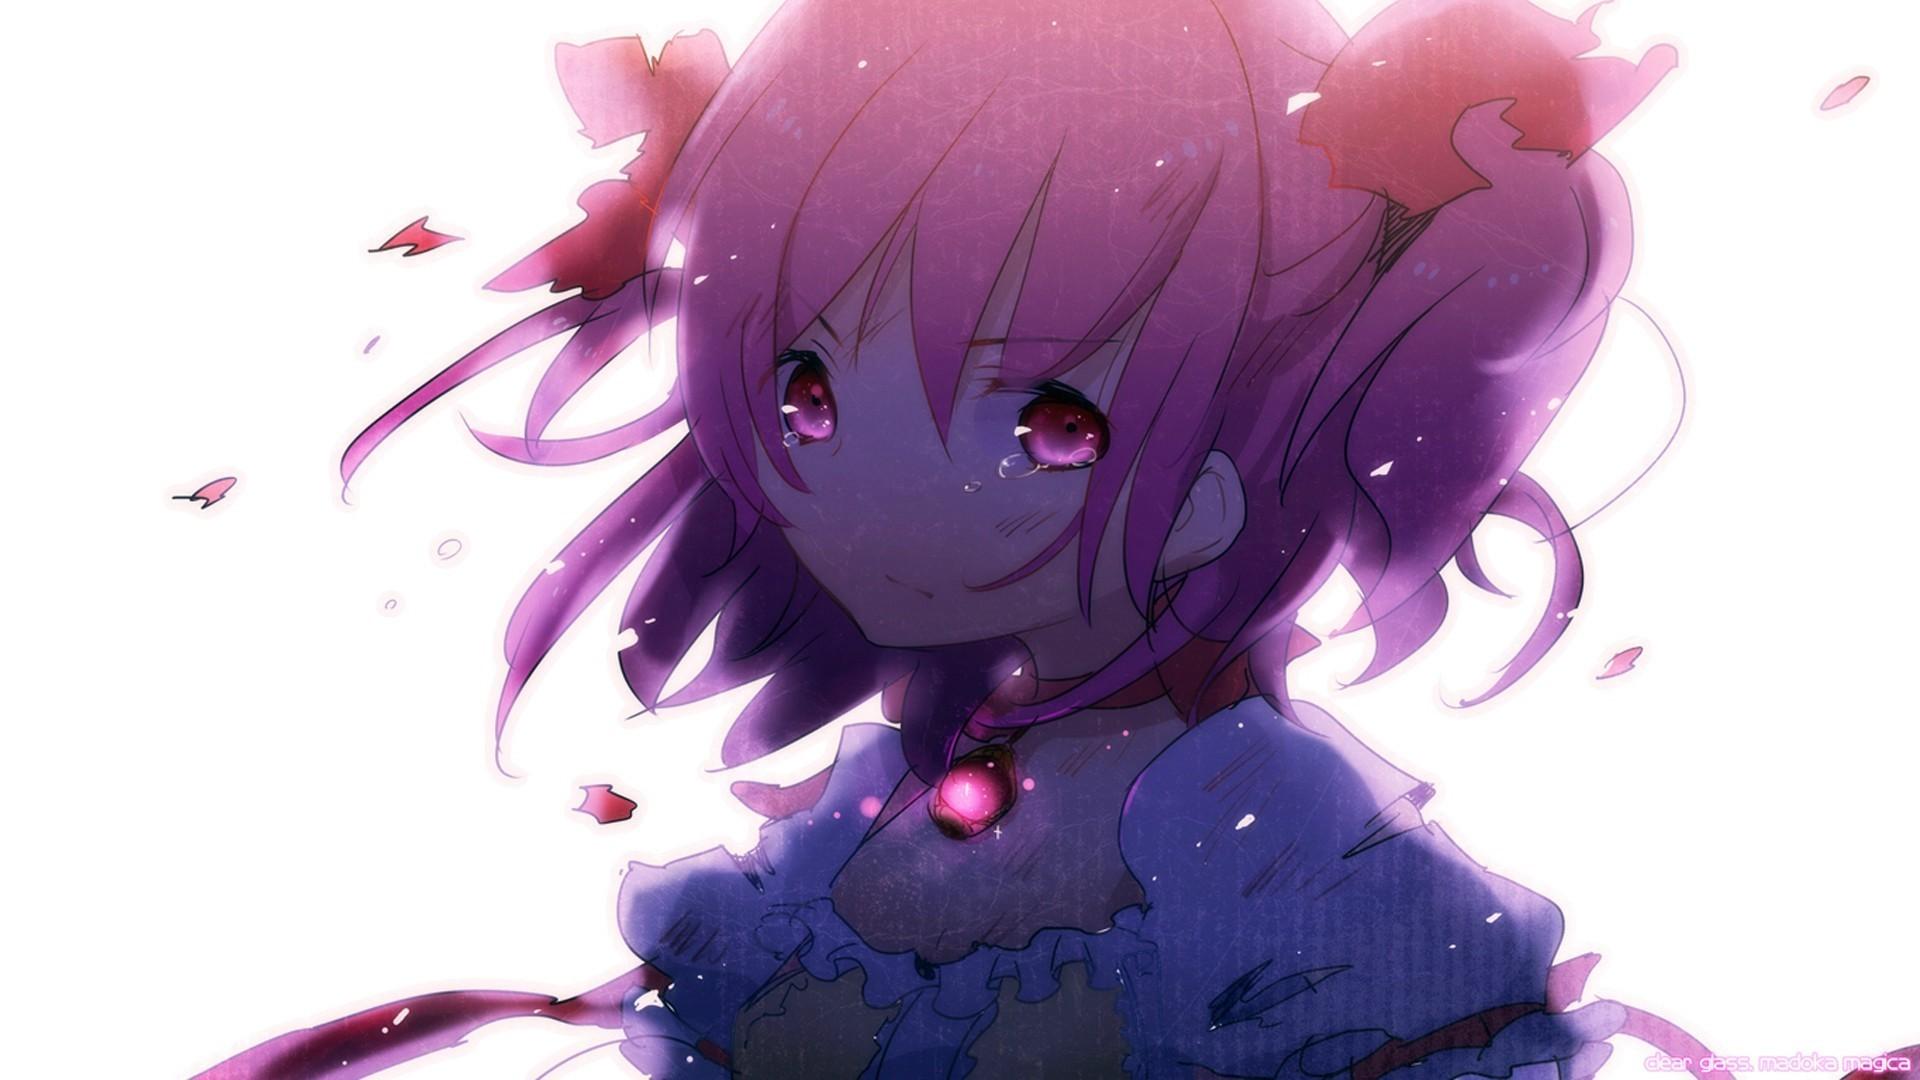 Free Download Tears Mahou Shoujo Madoka Magica Kaname Wallpaper